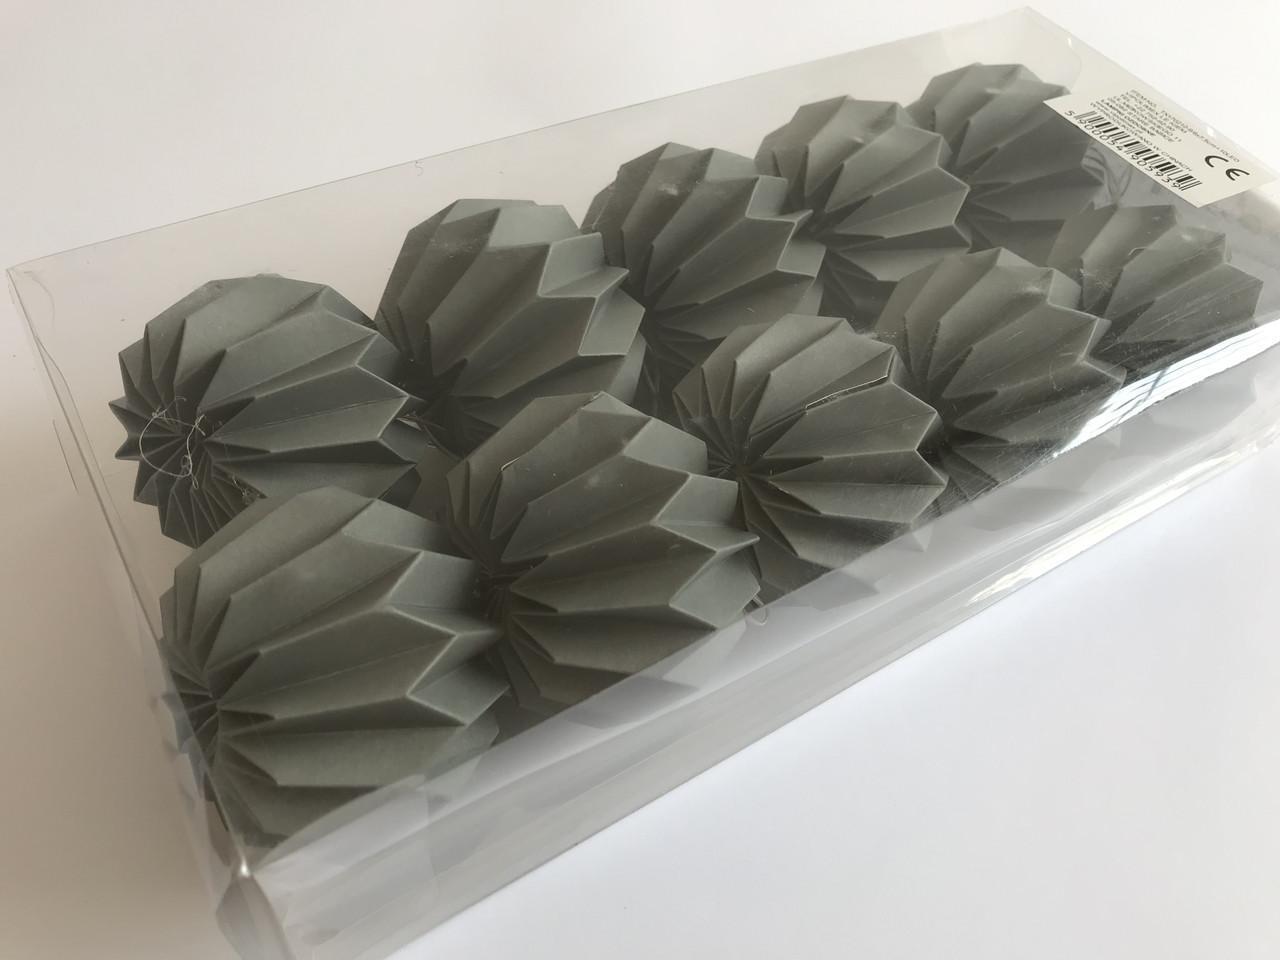 Гірлянда Decorino Dark Paper Balls 10led, діам 7.5 см, довжина 235см на батарейках АА